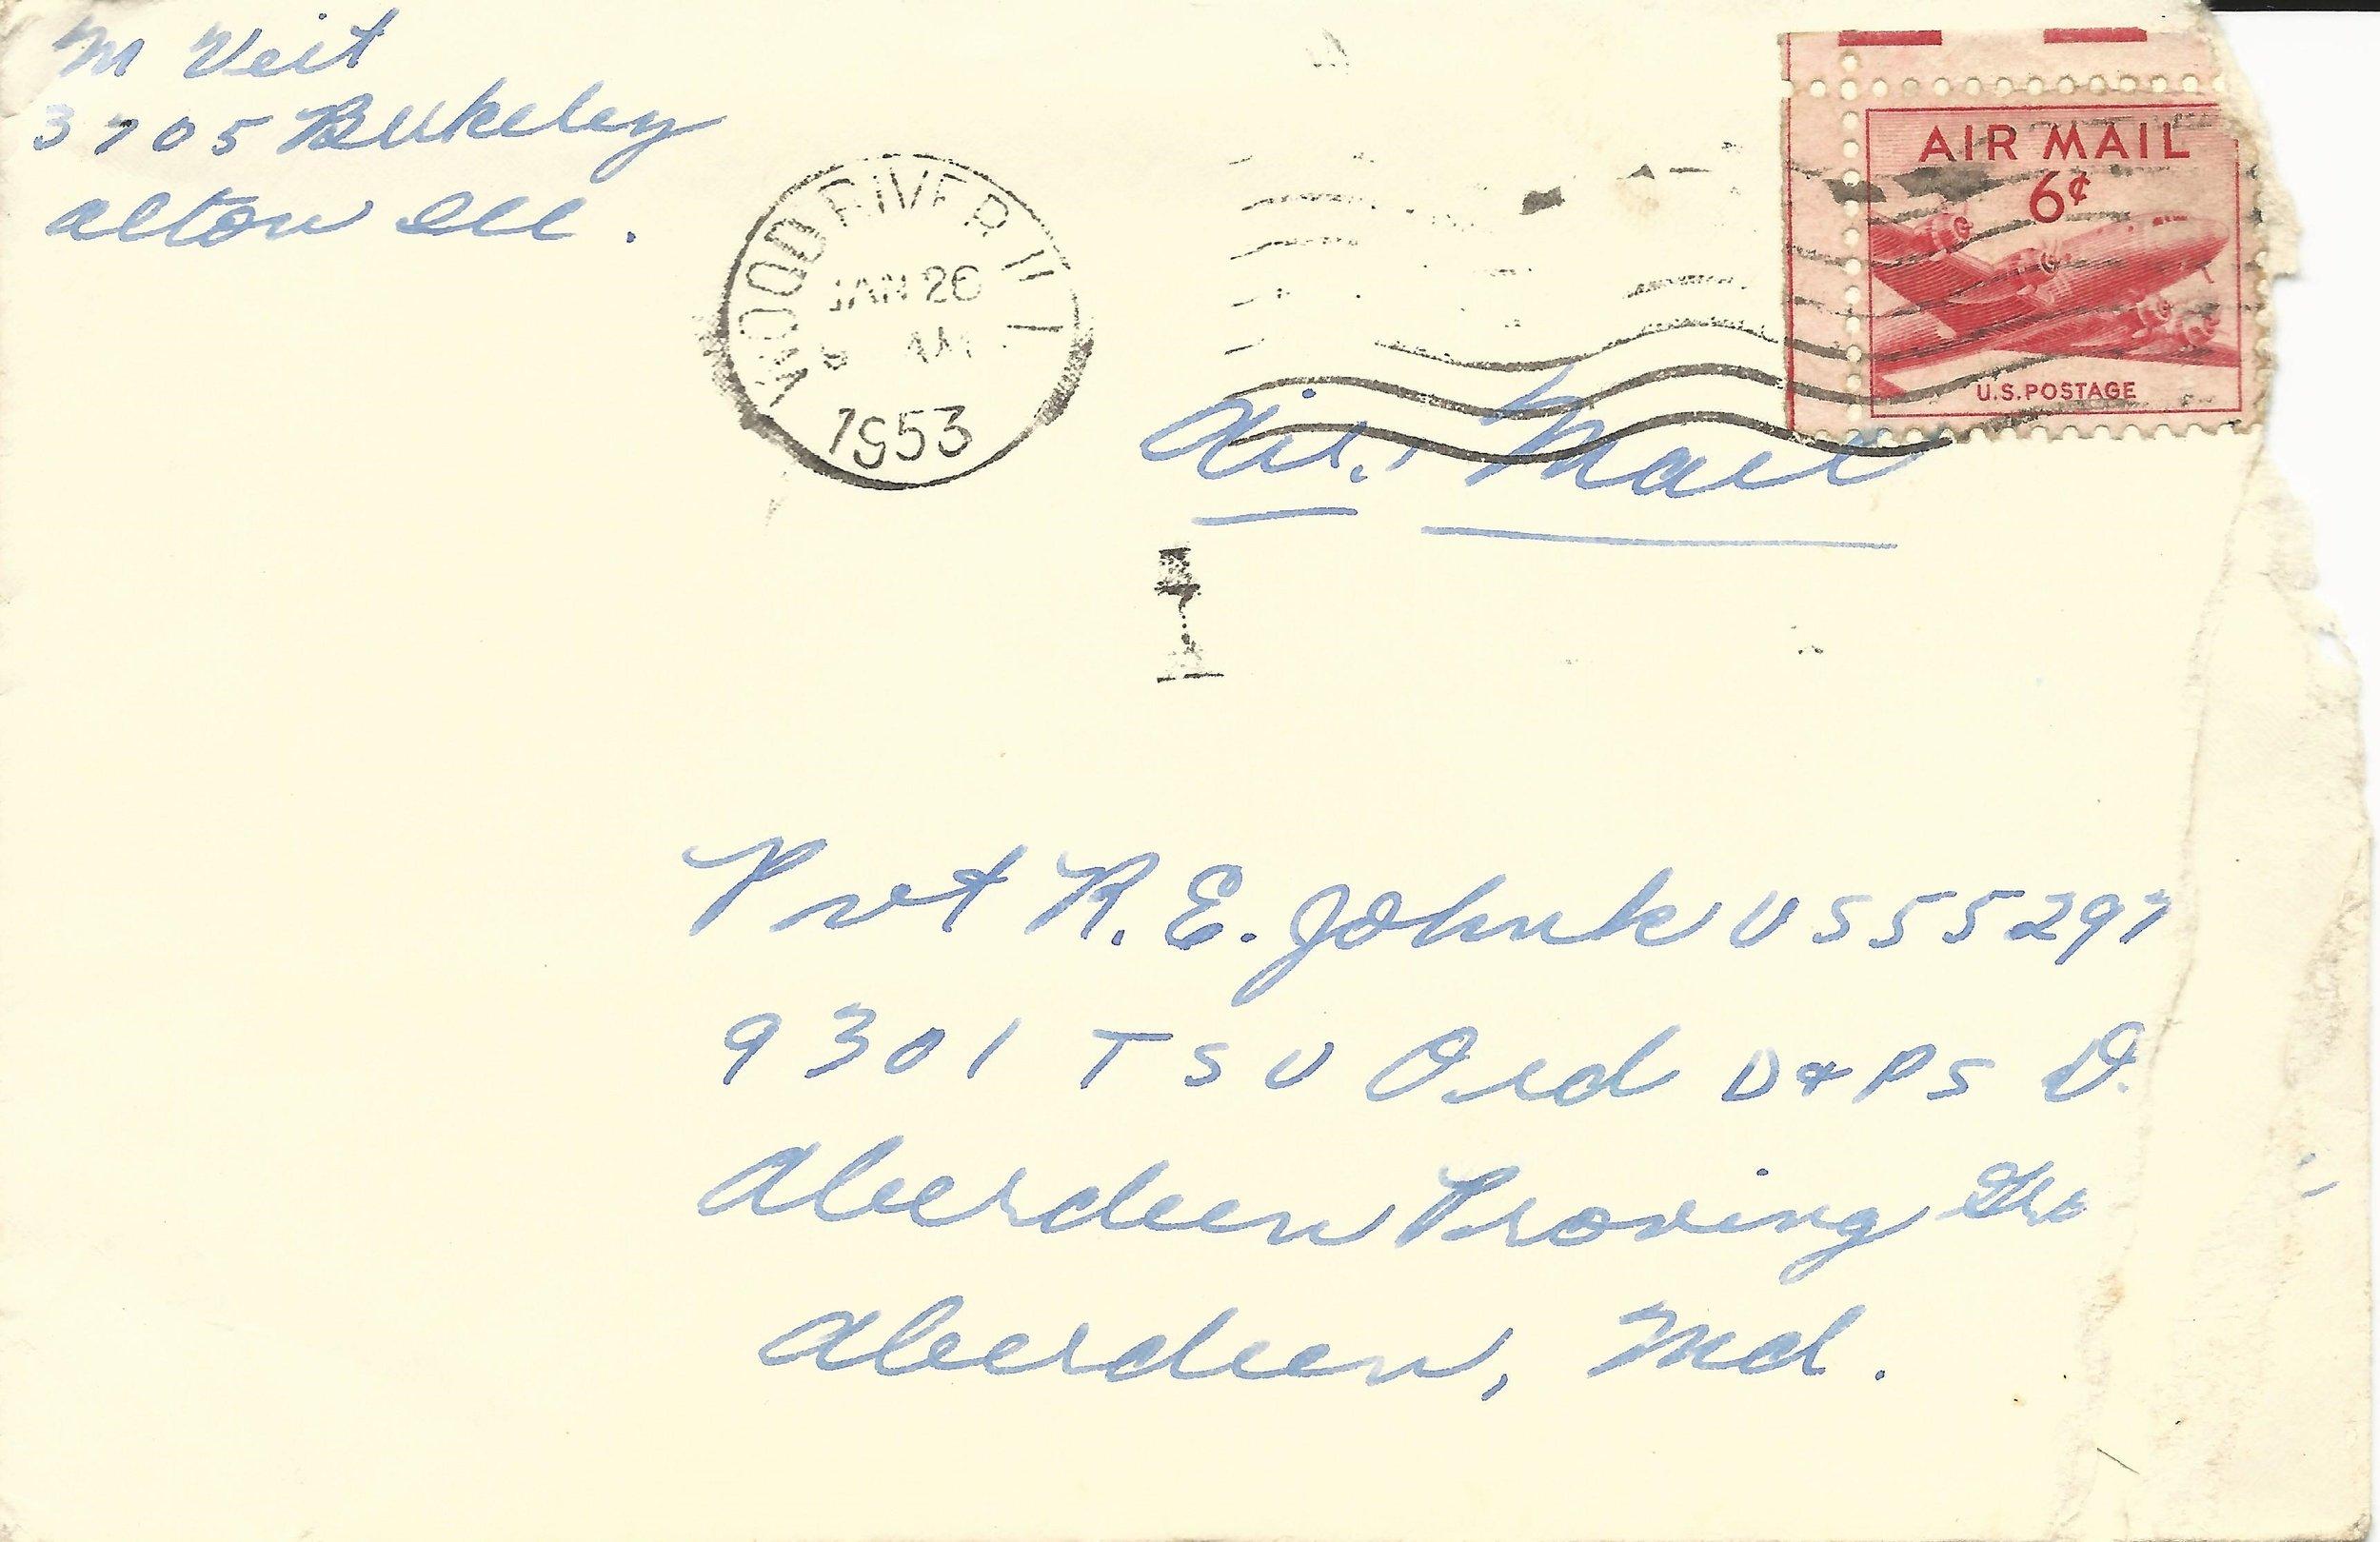 14. Jan. 25, 1953 (Oma)_Page_1.jpg